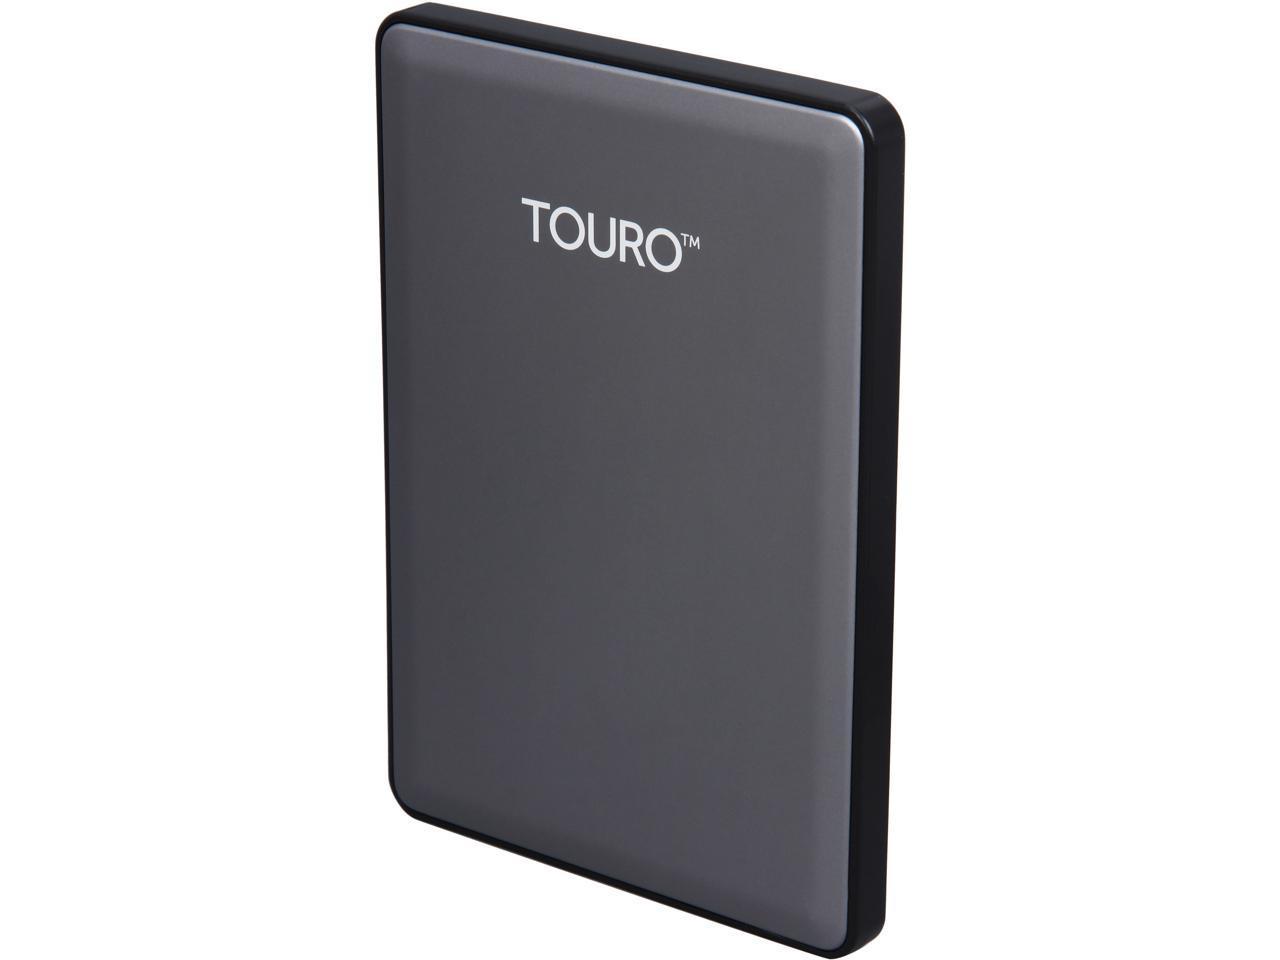 HGST Touro S 0S03694 1TB USB 3.0 Portable Hard Drive